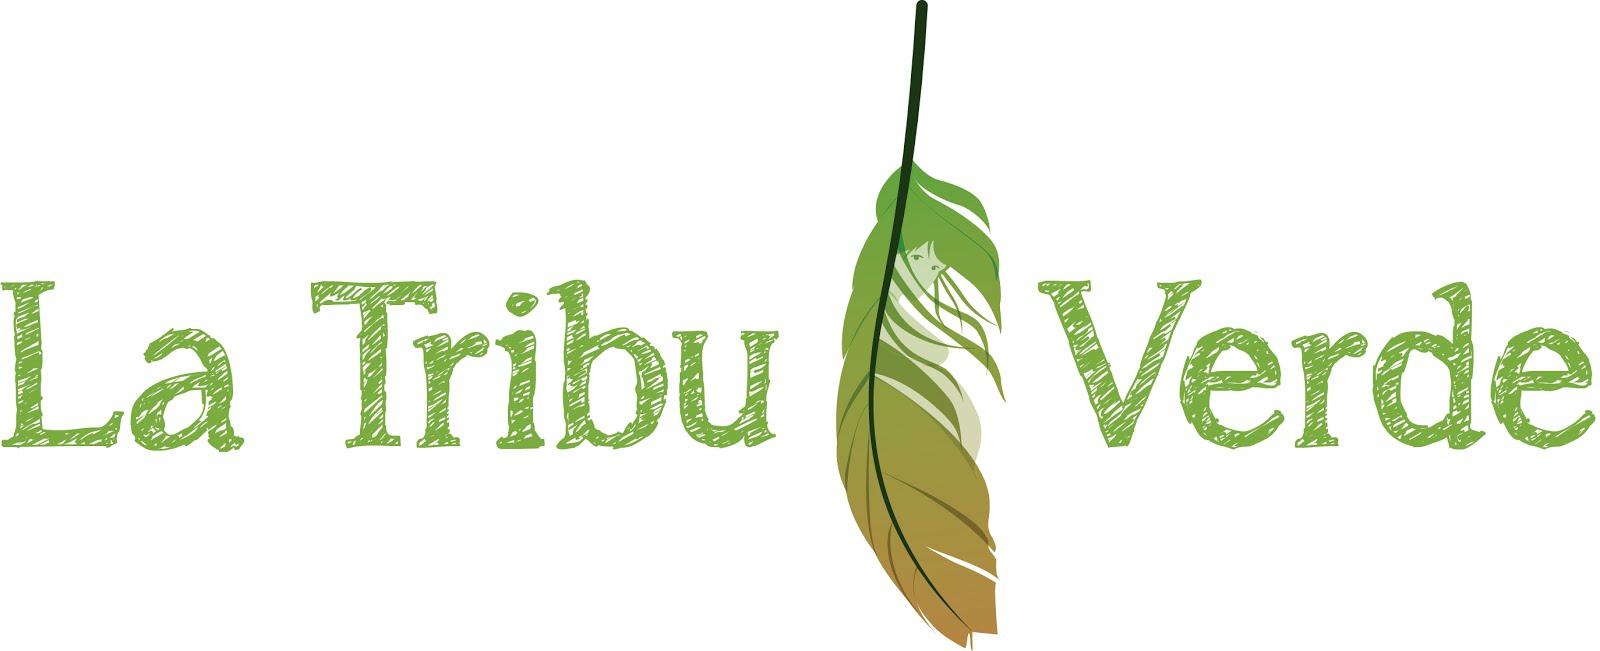 La Tribu Verde - Espacio eco saludable para toda la familia.